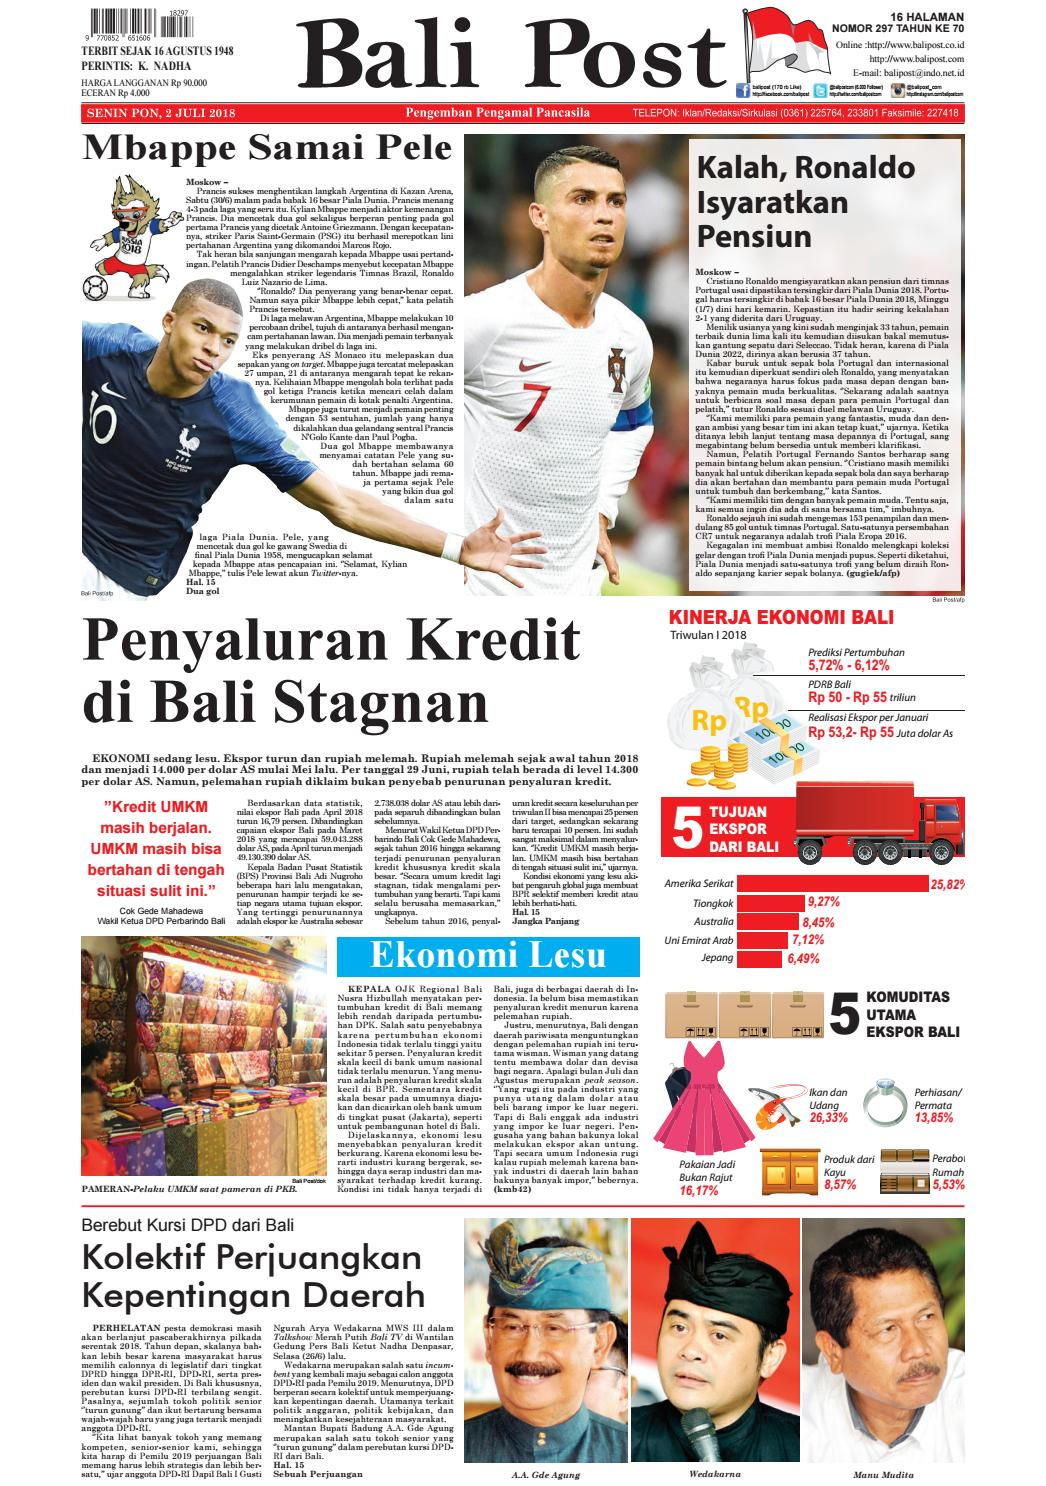 Edisi 2 Juli 2018 Balipostcom By E Paper Kmb Issuu Produk Ukm Bumn Ring Berlian Eropa